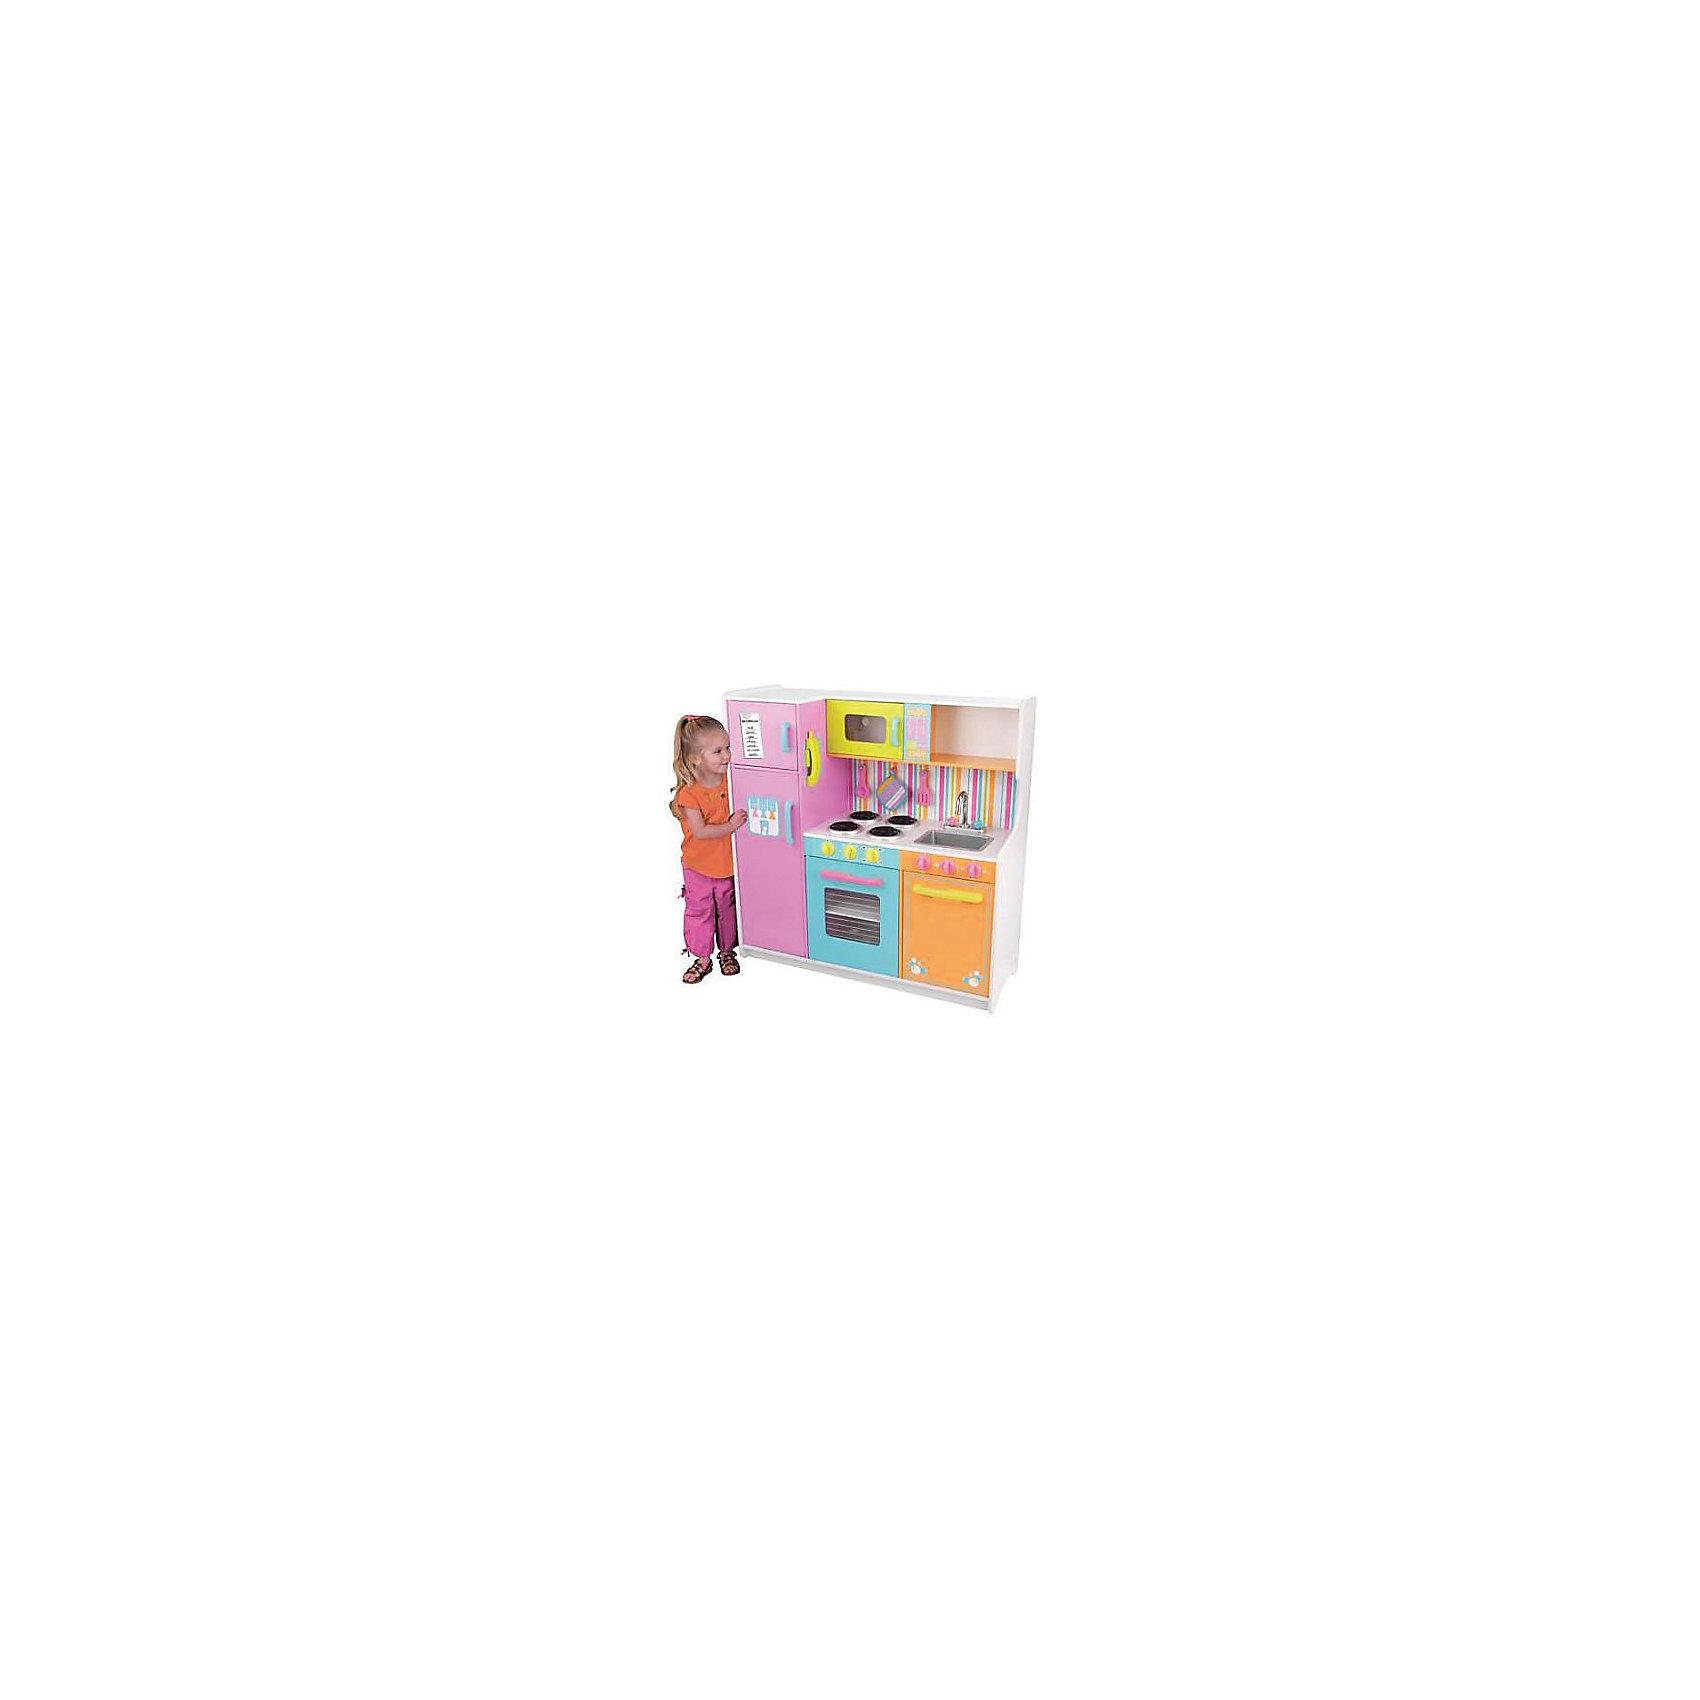 "KidKraft Большая детская игровая кухня «Делюкс» (Deluxe Big & Bright Kitchen), KidKraft kidkraft тостер игрушечный ""bright"" kidkraft"